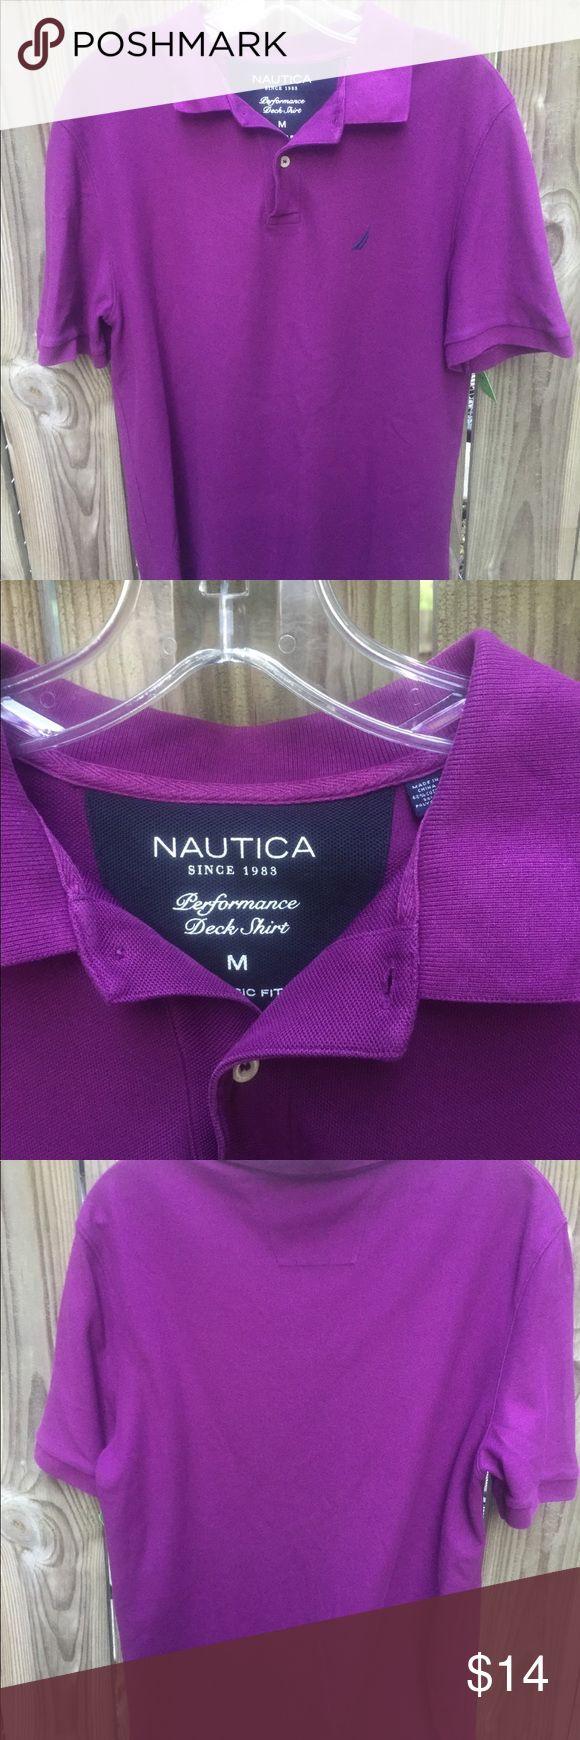 Nautica Purple Polo Shirt Men's shirt sleeve purple Nautica shirt.  Size Large.  Gently used. Nautica Shirts Polos